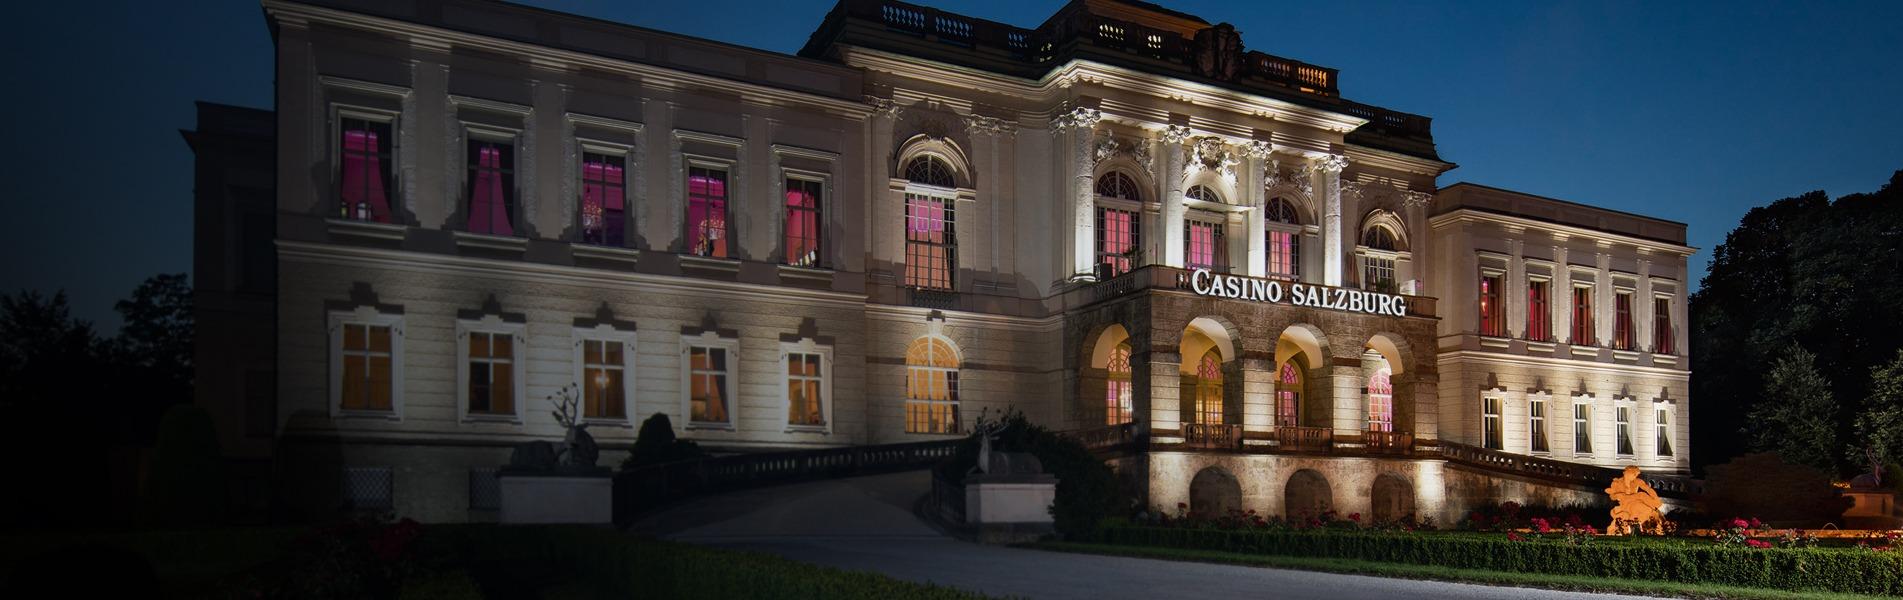 Casino Salzburg 1